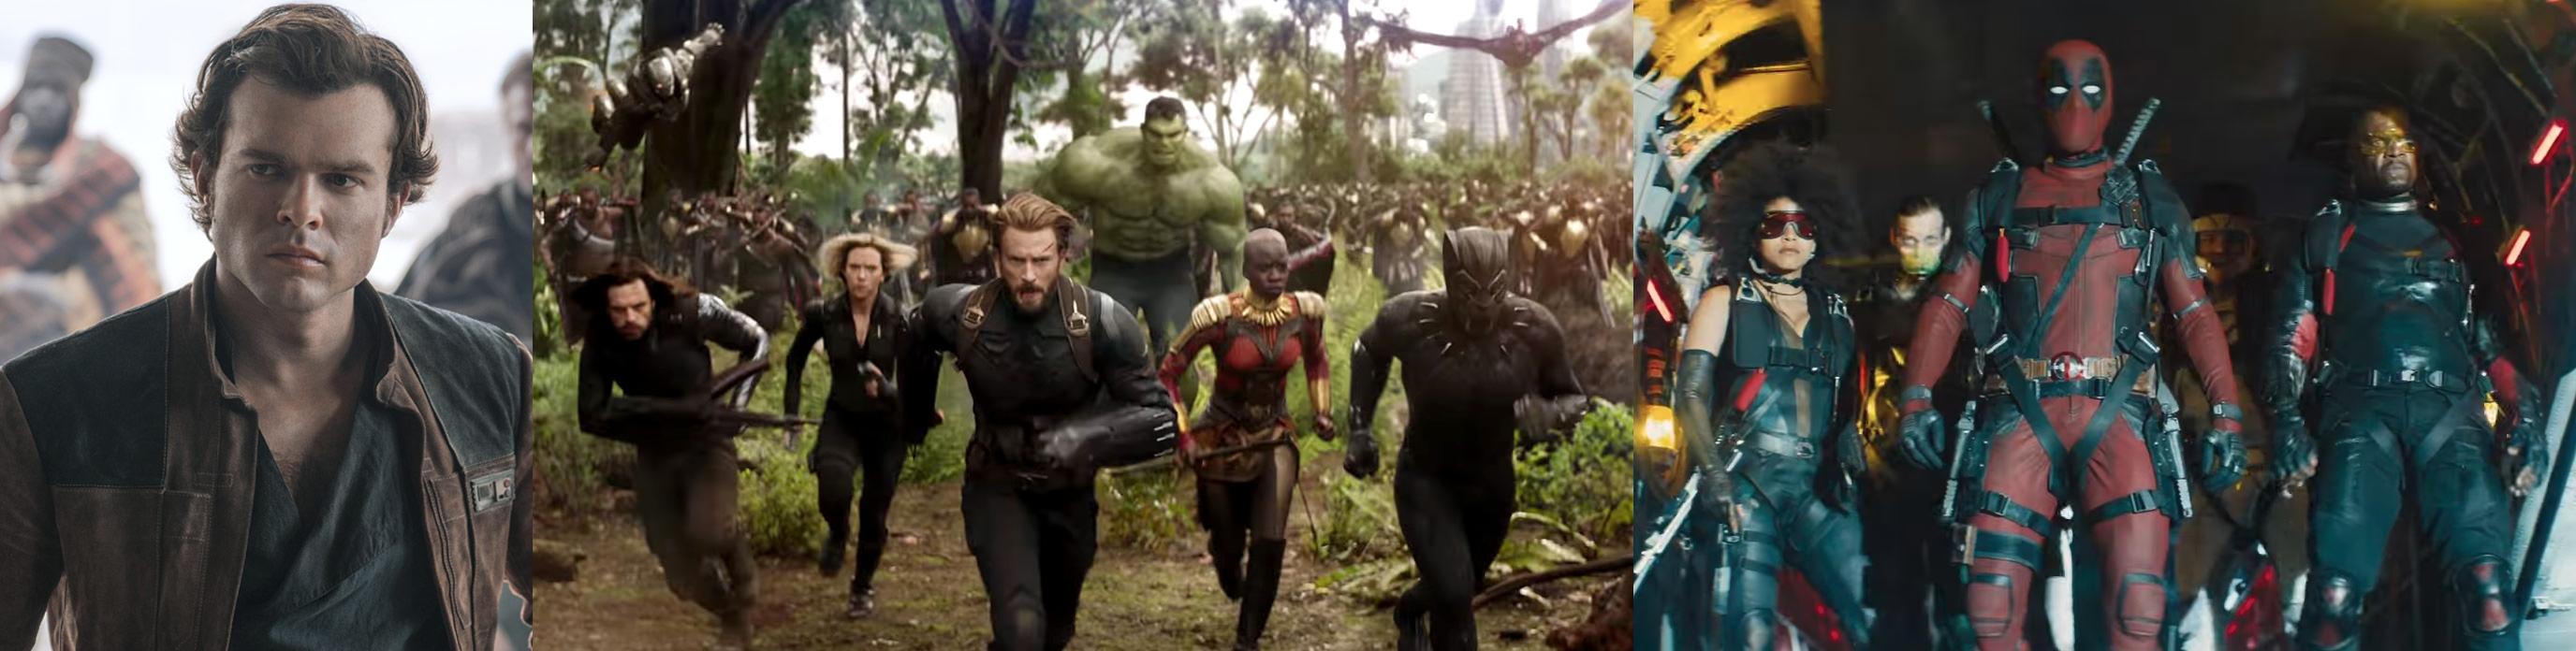 Avengers release date